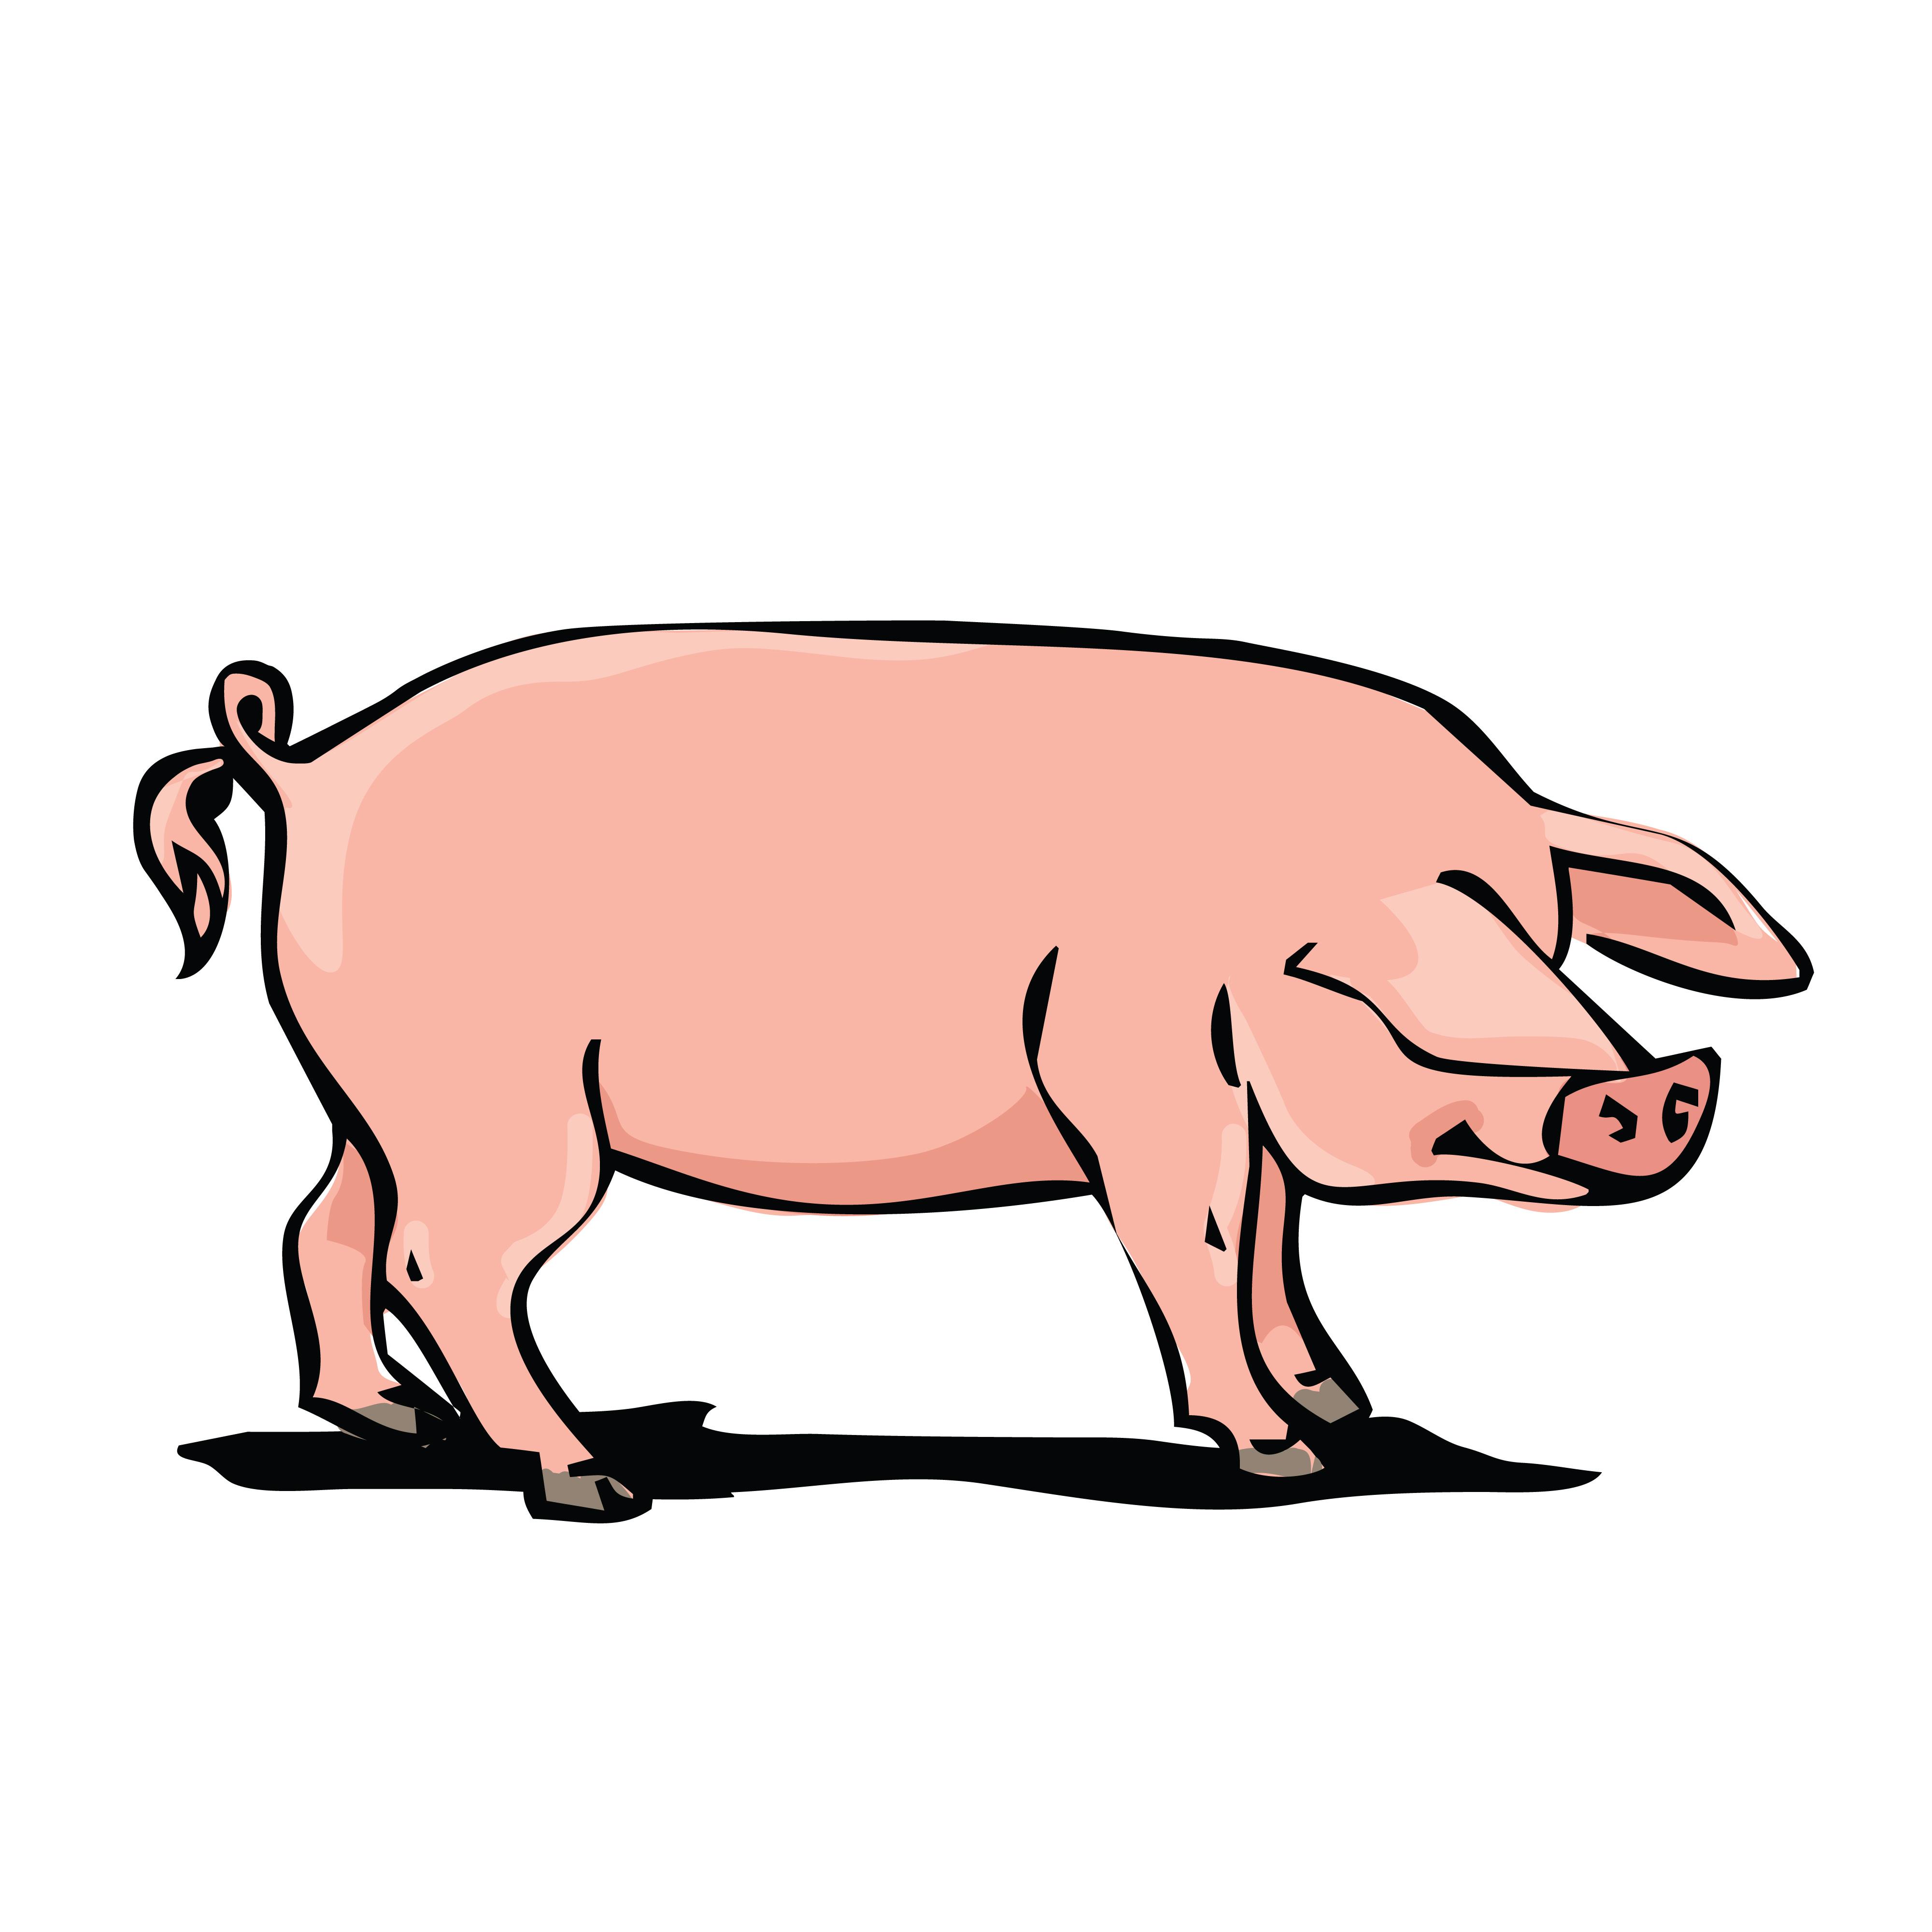 4000x4000 Free Clipart Of A Hog